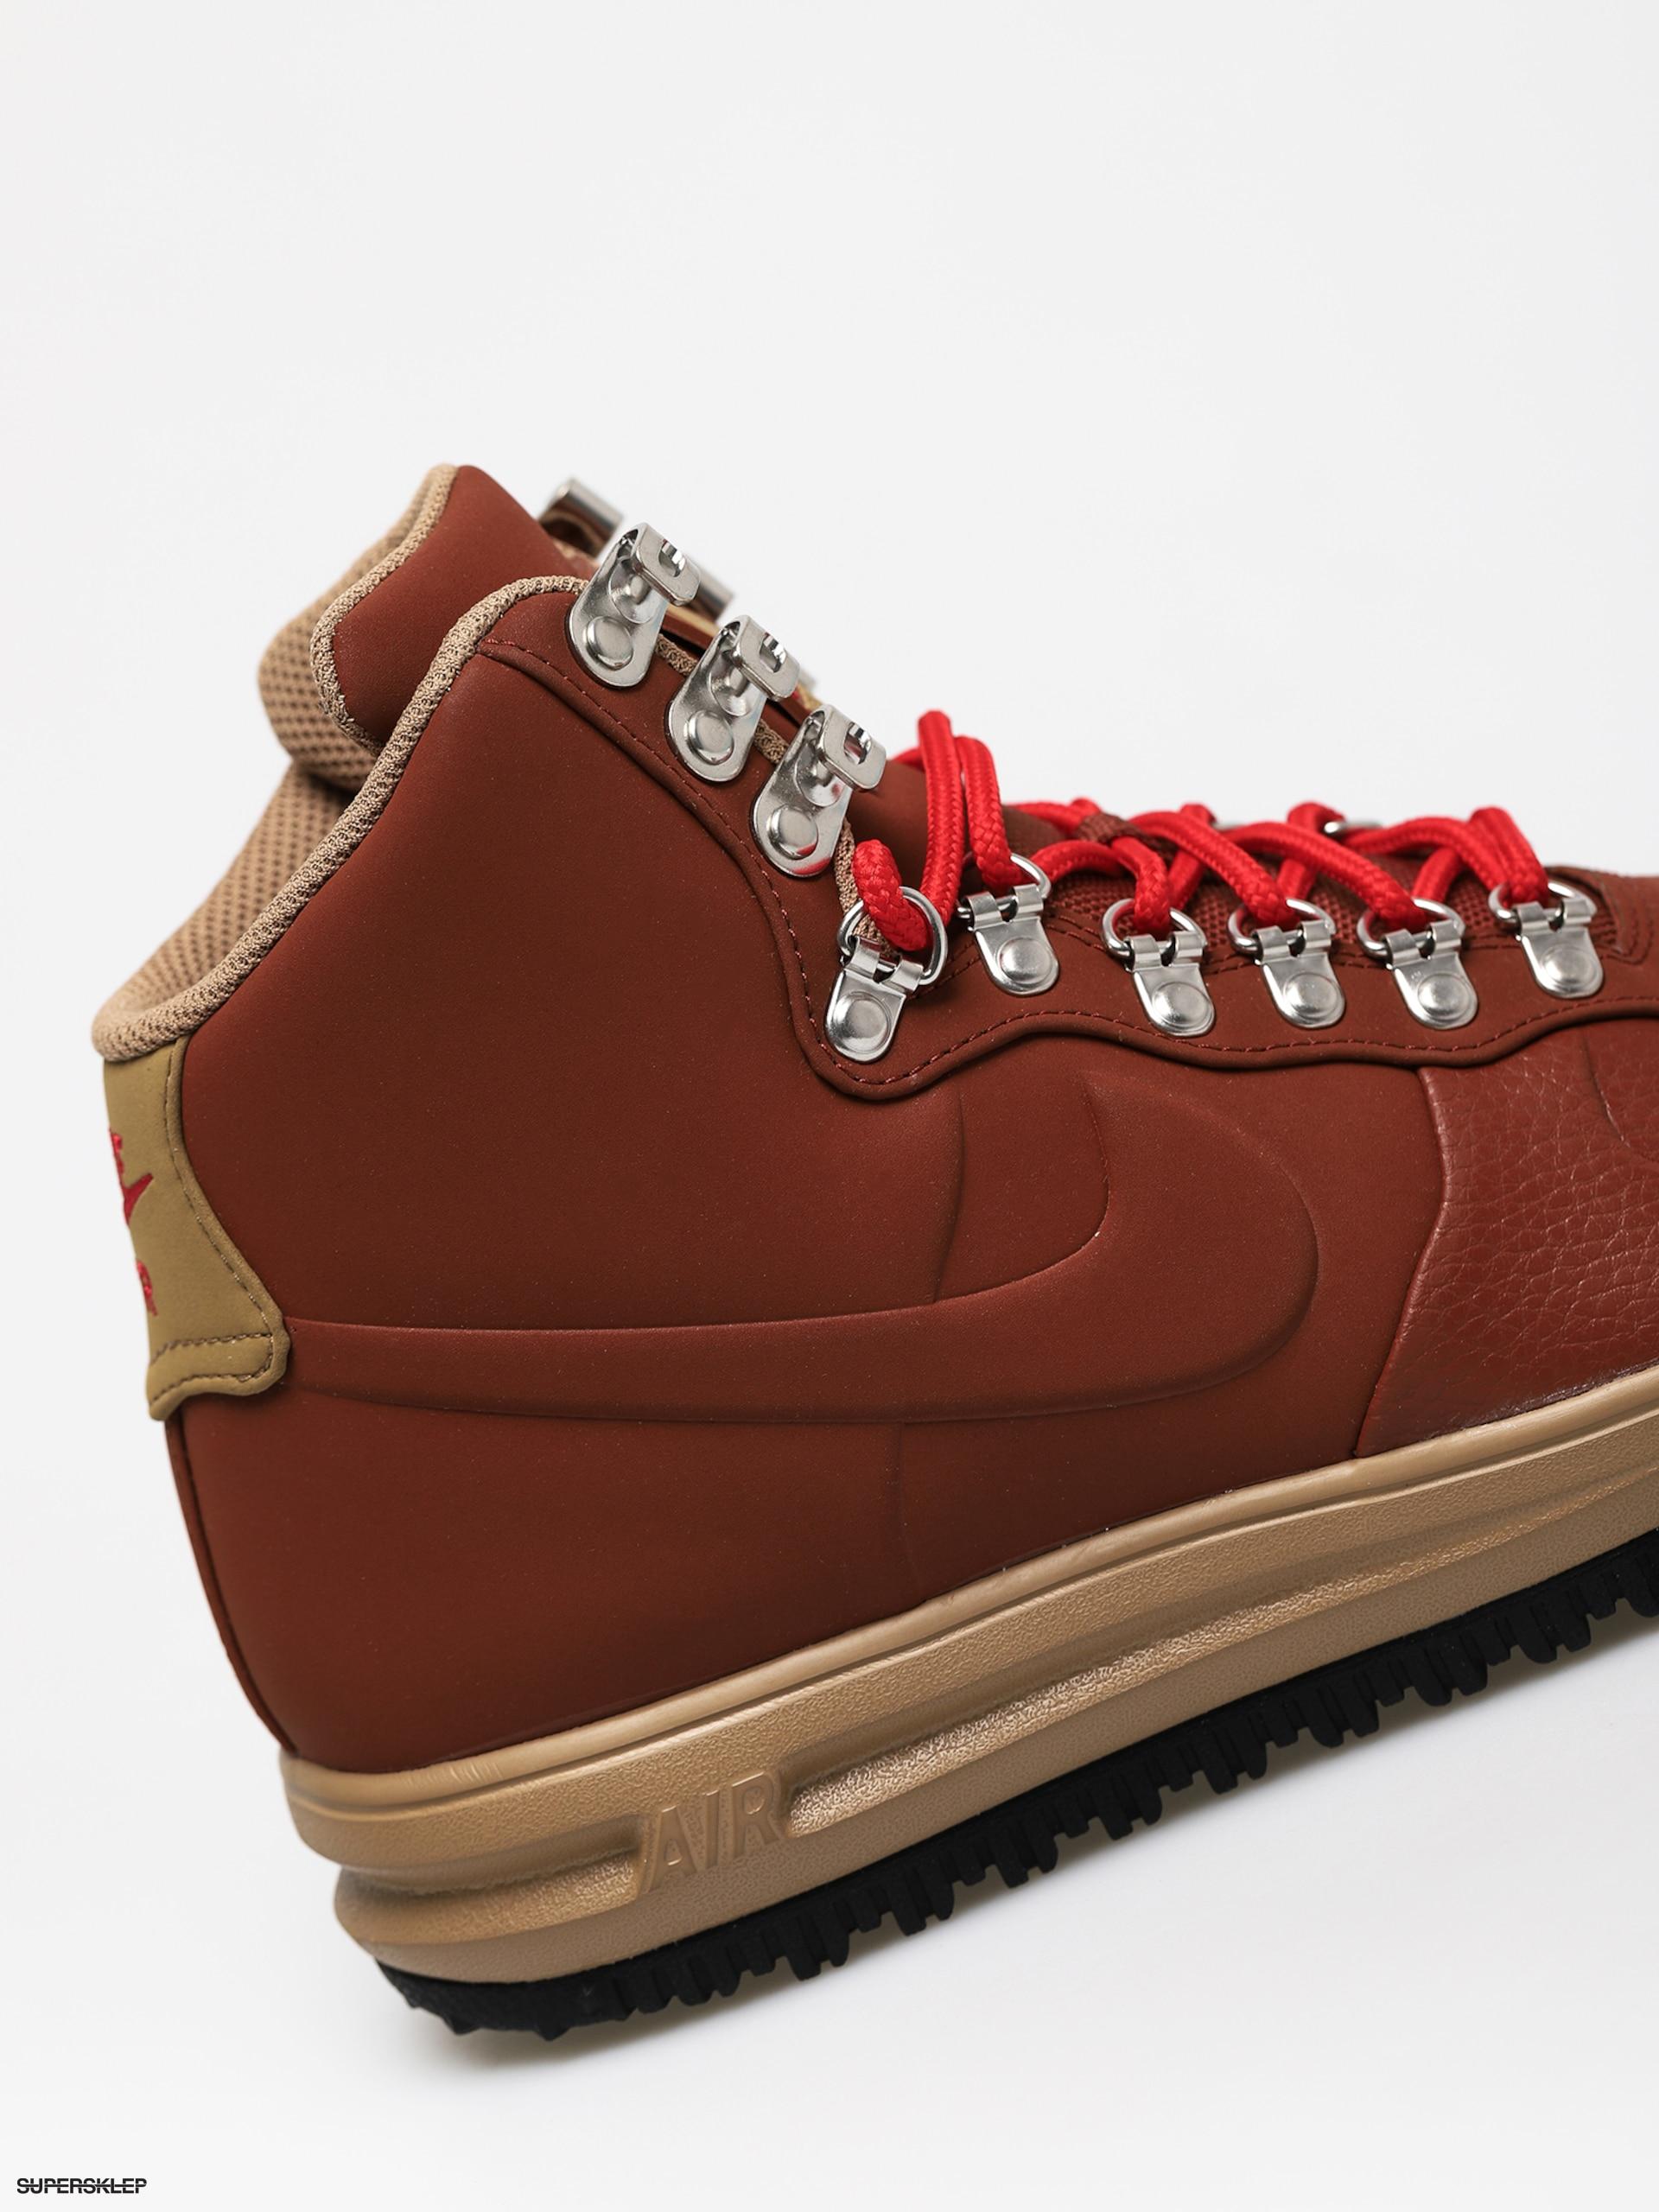 Buty Nike Lunar Force 1 18 (cinnamonbeechtree black university red)